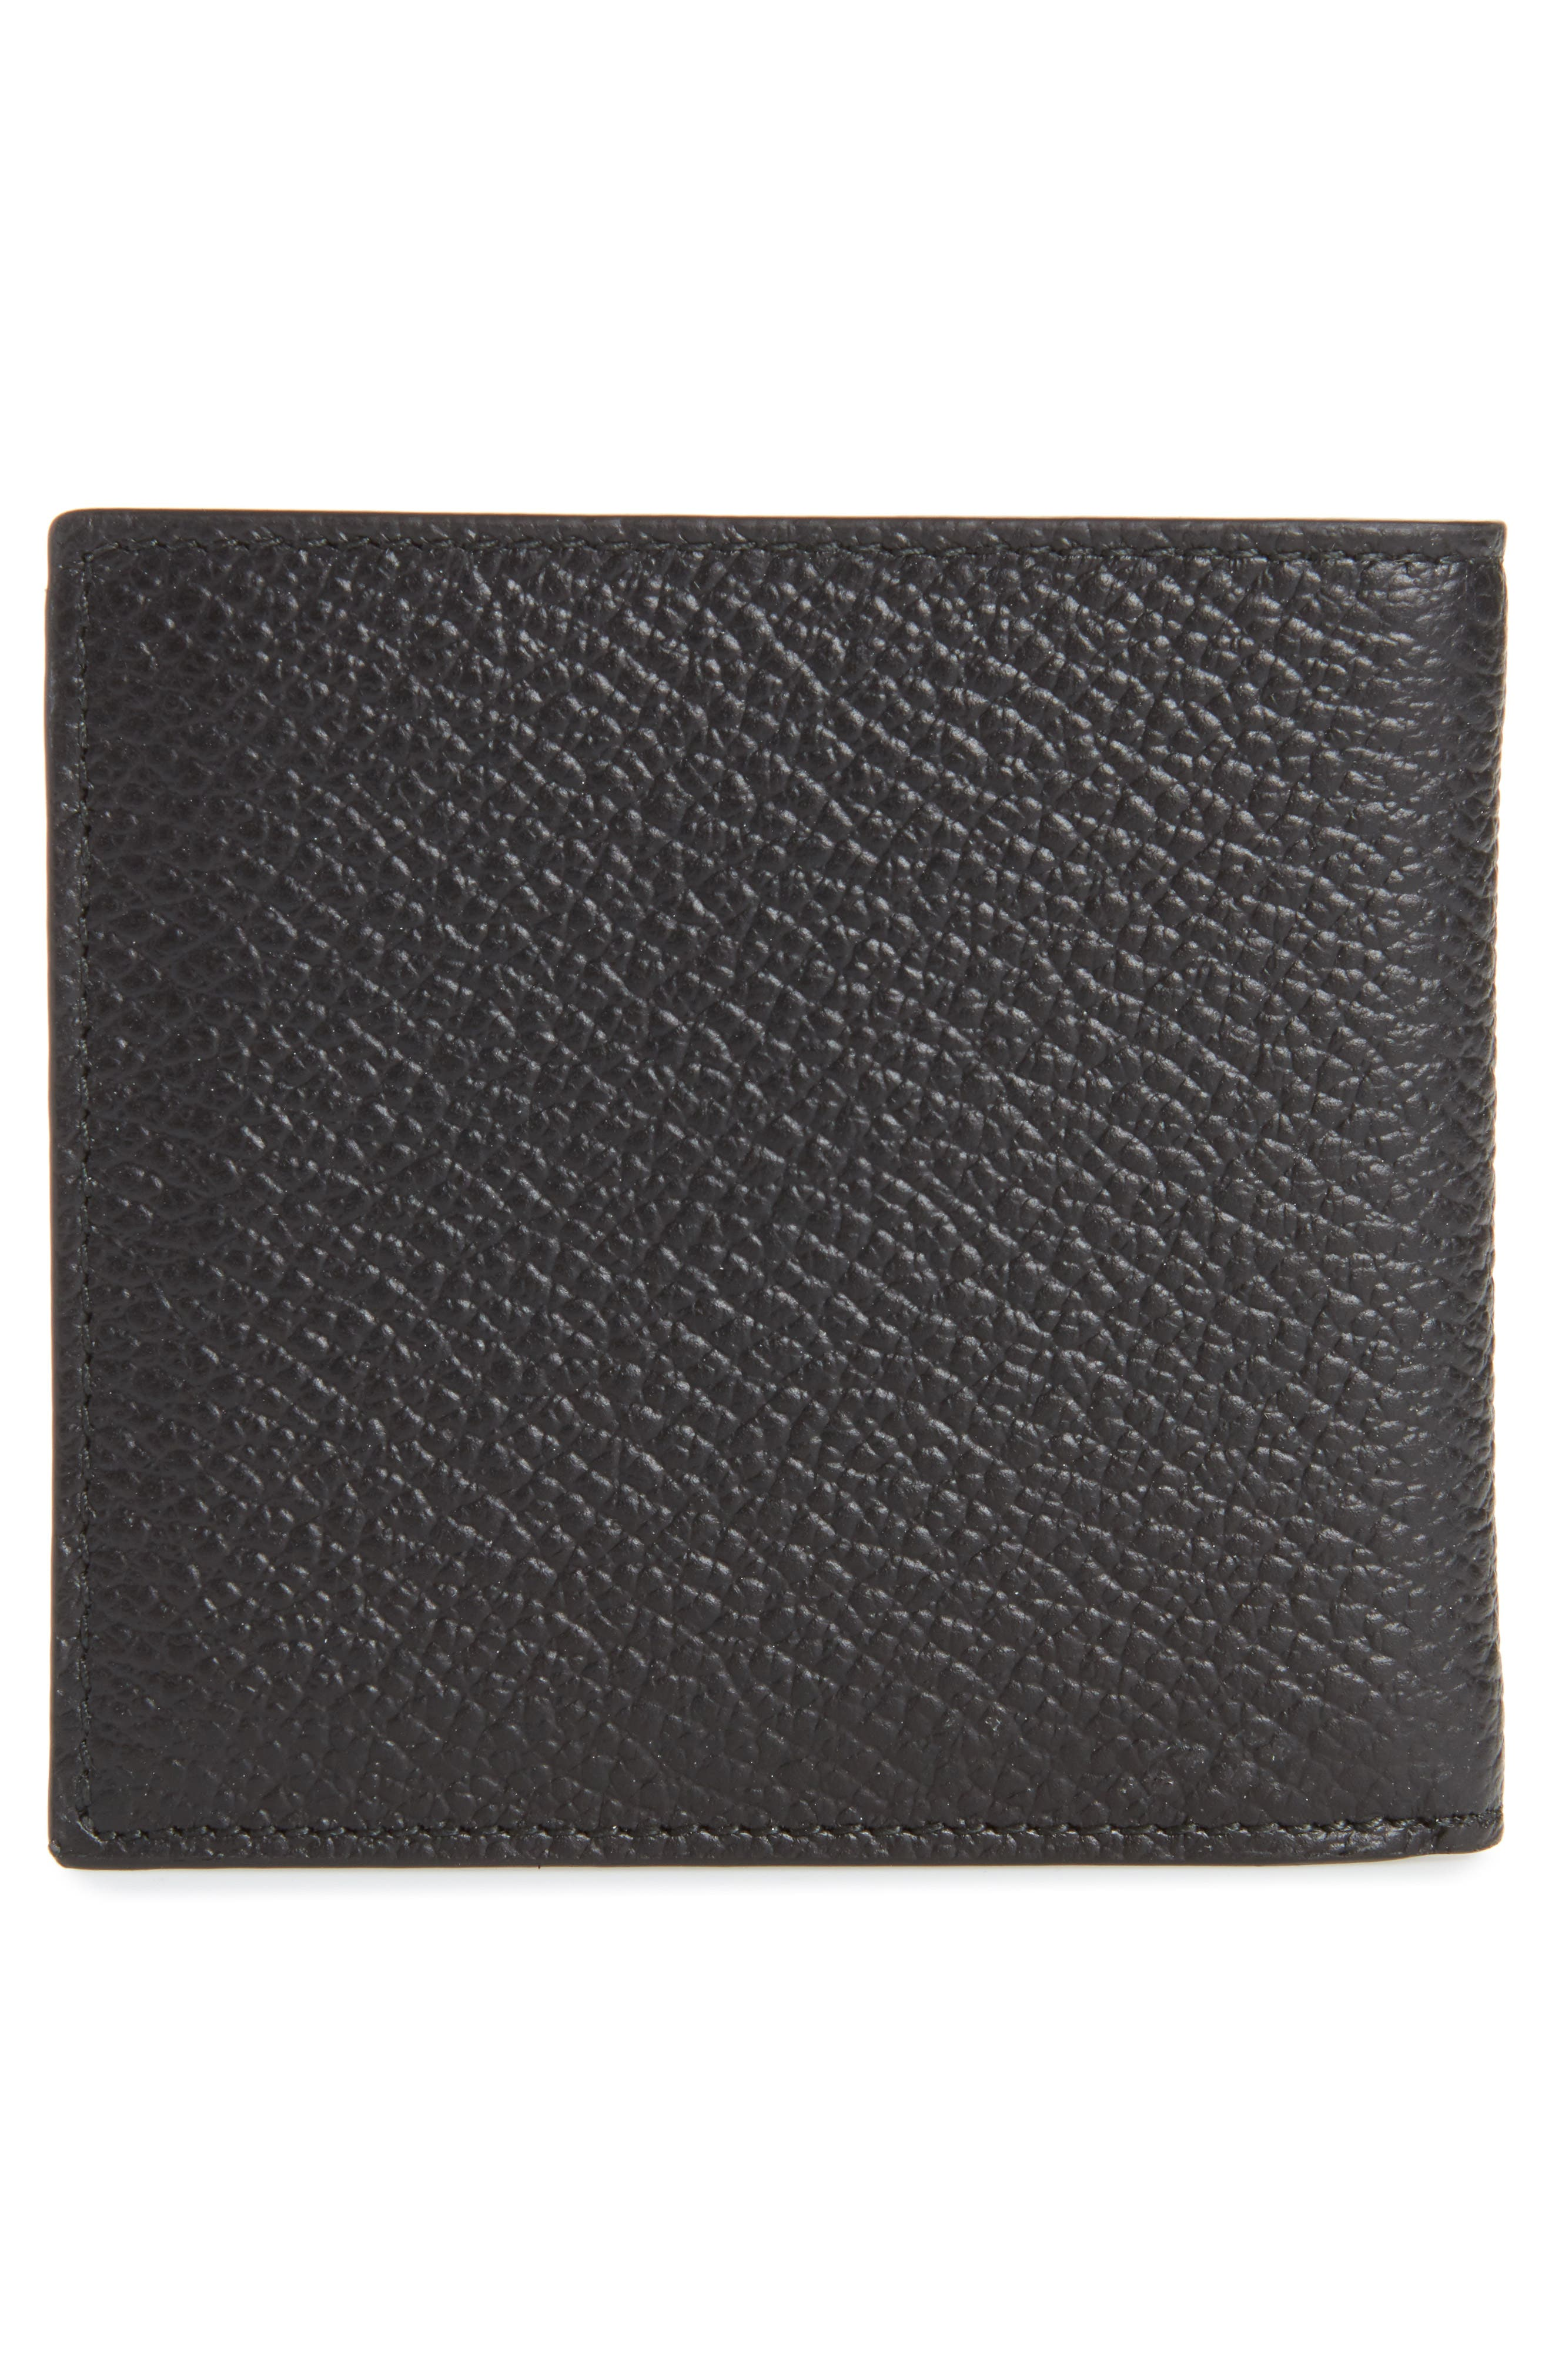 Leather Billfold Wallet,                             Alternate thumbnail 2, color,                             Black